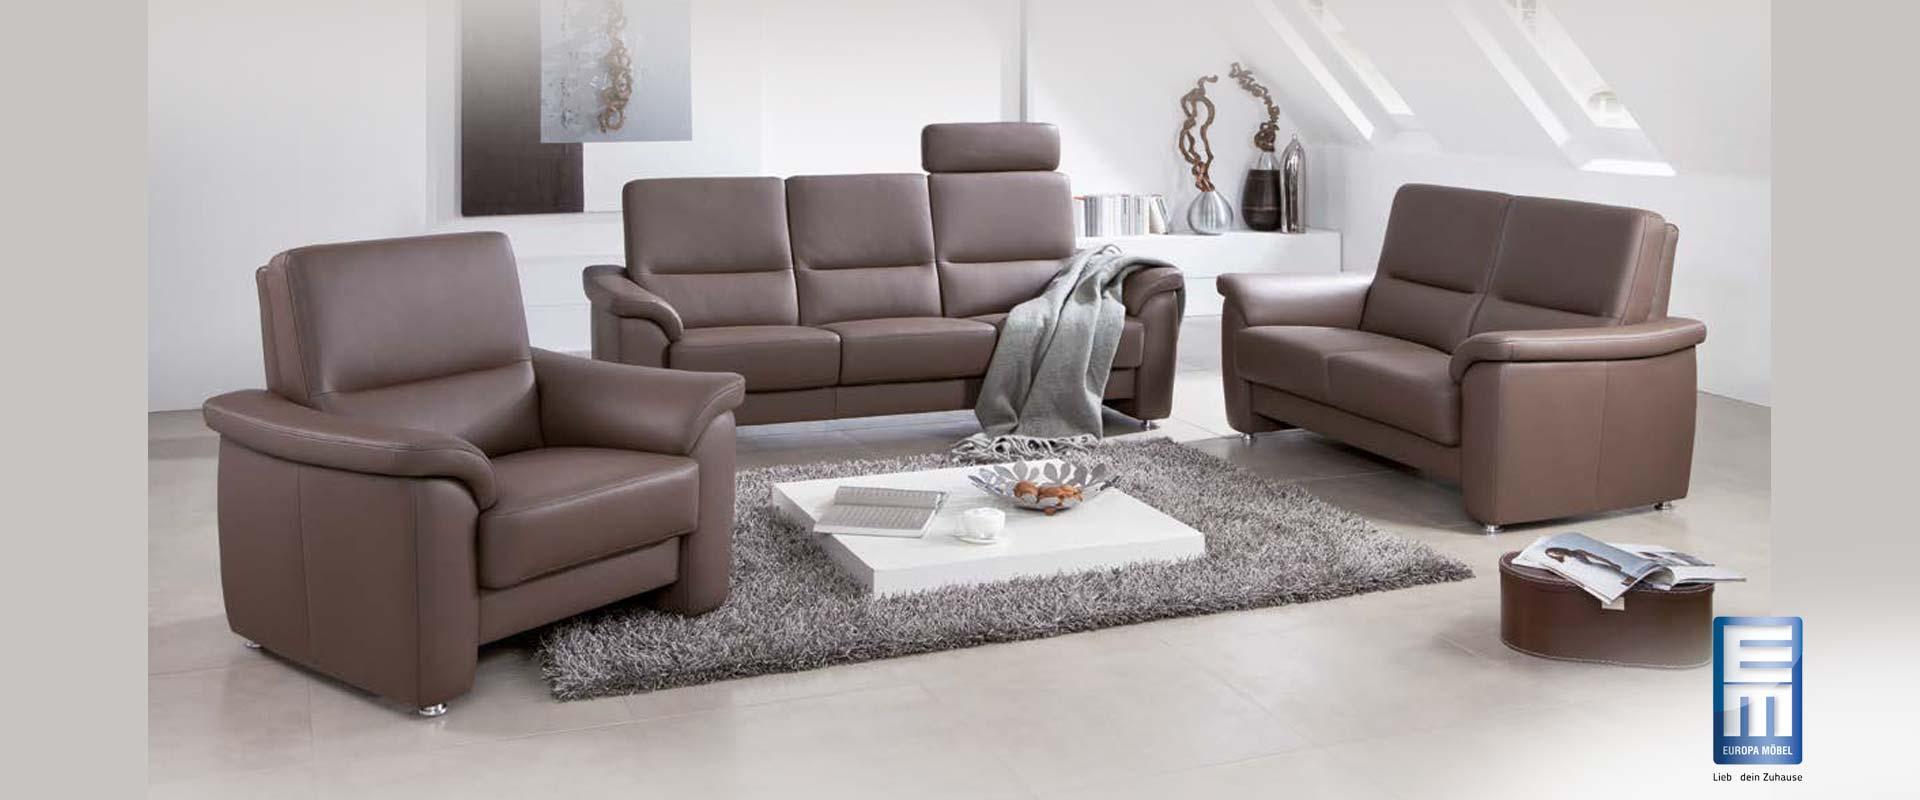 domeyer m bel berlin domeyer m bel und k chen. Black Bedroom Furniture Sets. Home Design Ideas